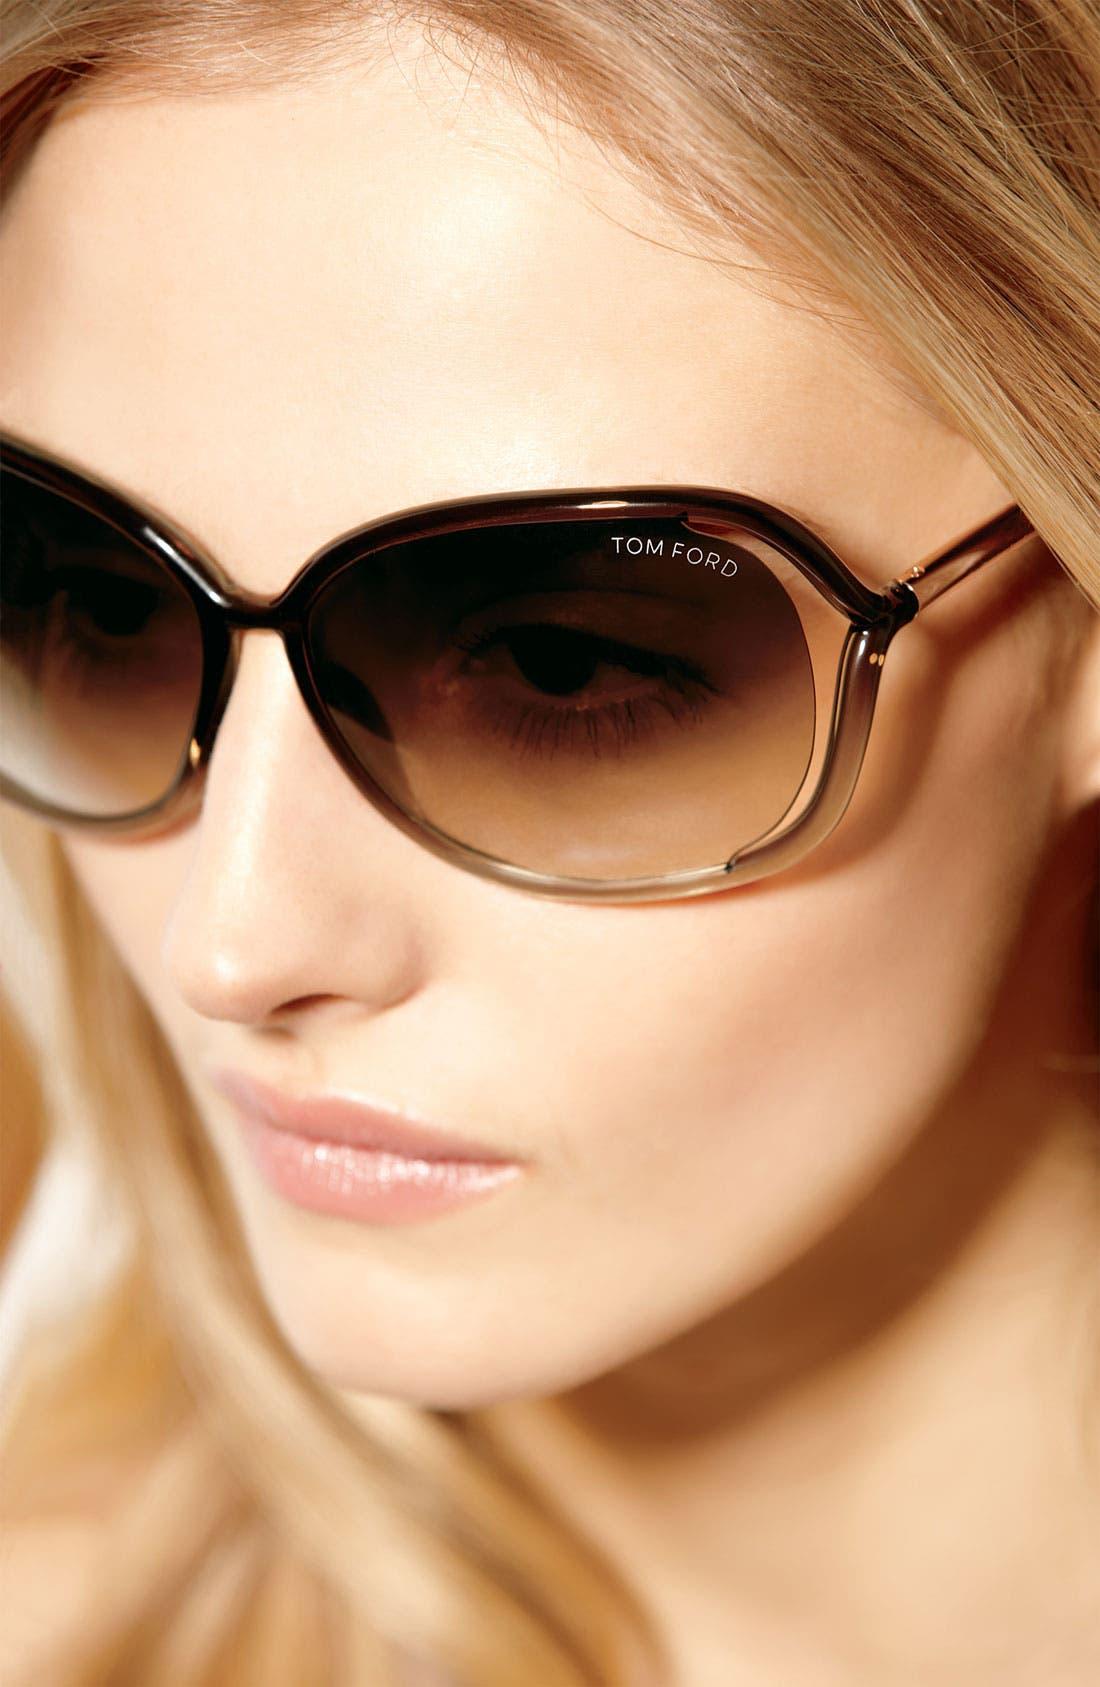 'Raquel' 63mm Oversized Open Side Sunglasses,                             Alternate thumbnail 3, color,                             TRANSPARENT BRONZE